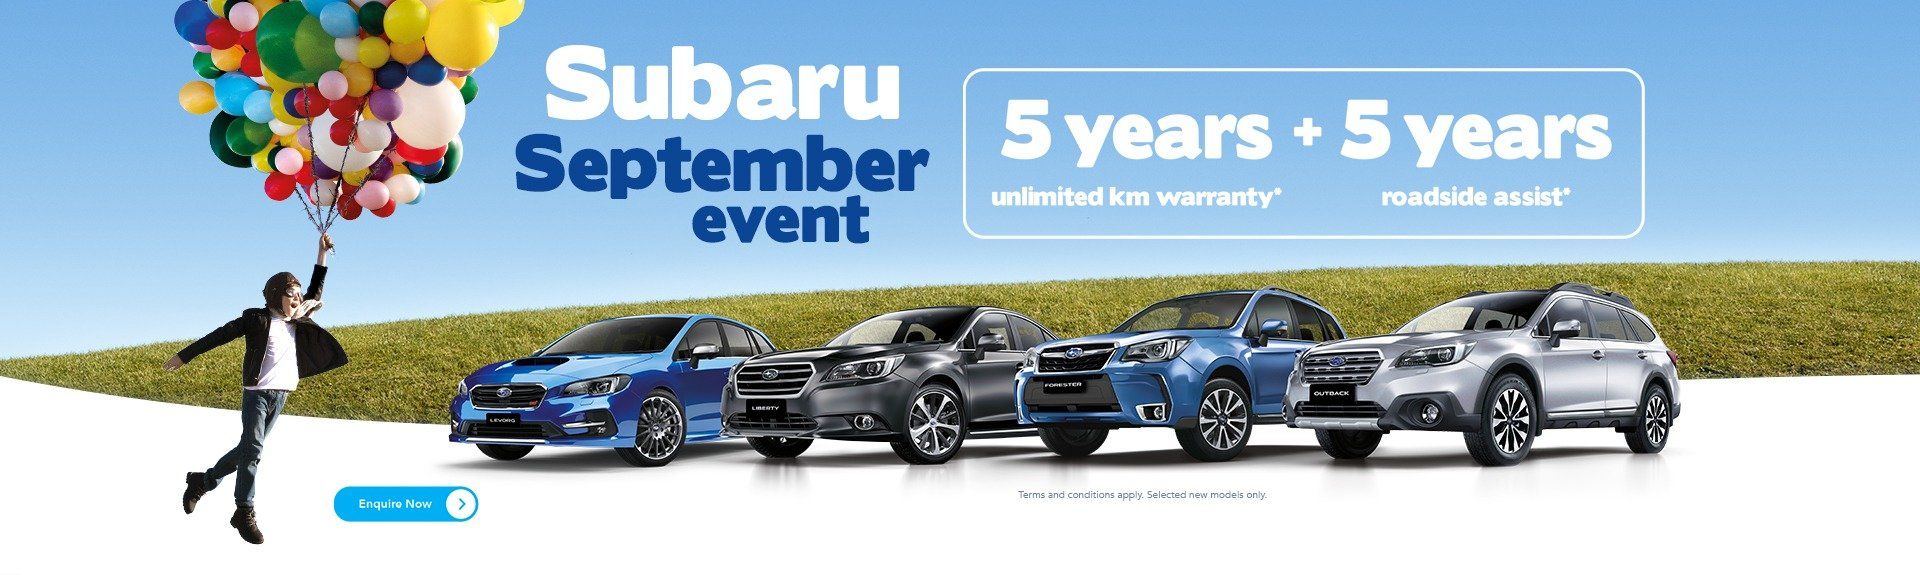 Subaru September Offer